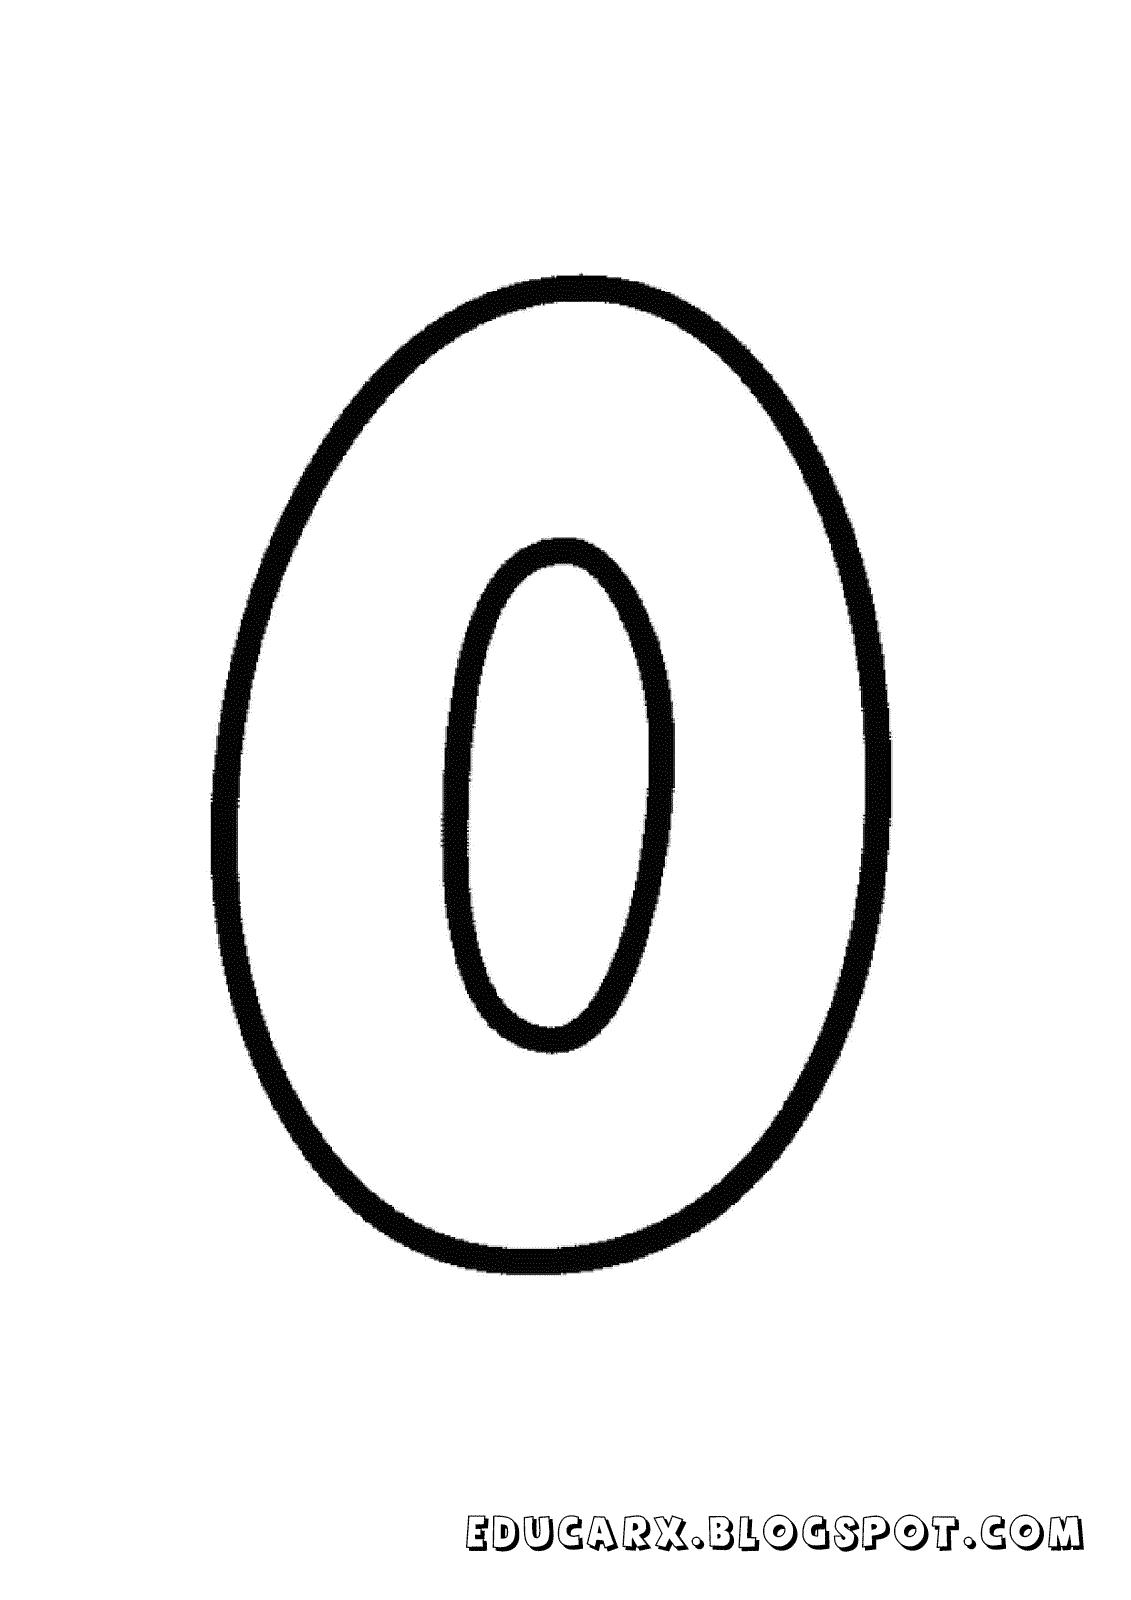 Molde da letra minuscula o